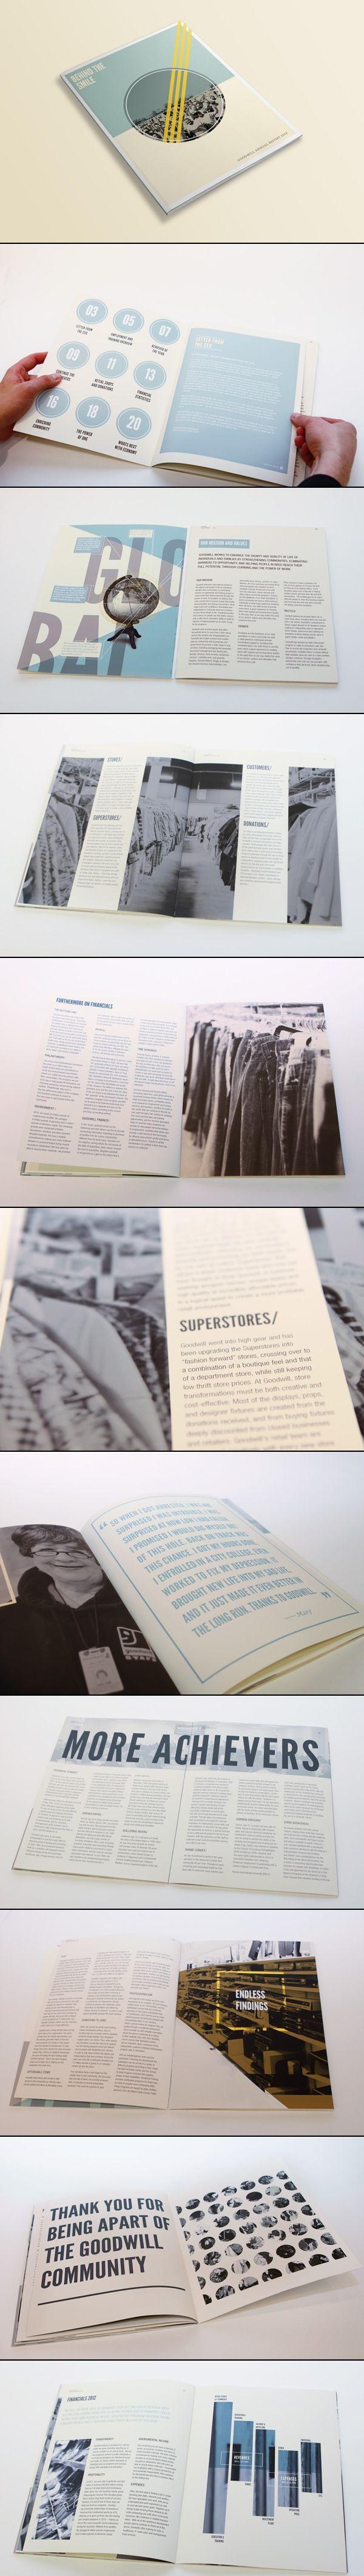 Goodwill Annual Report   by Lauren Coleman (via Behance)